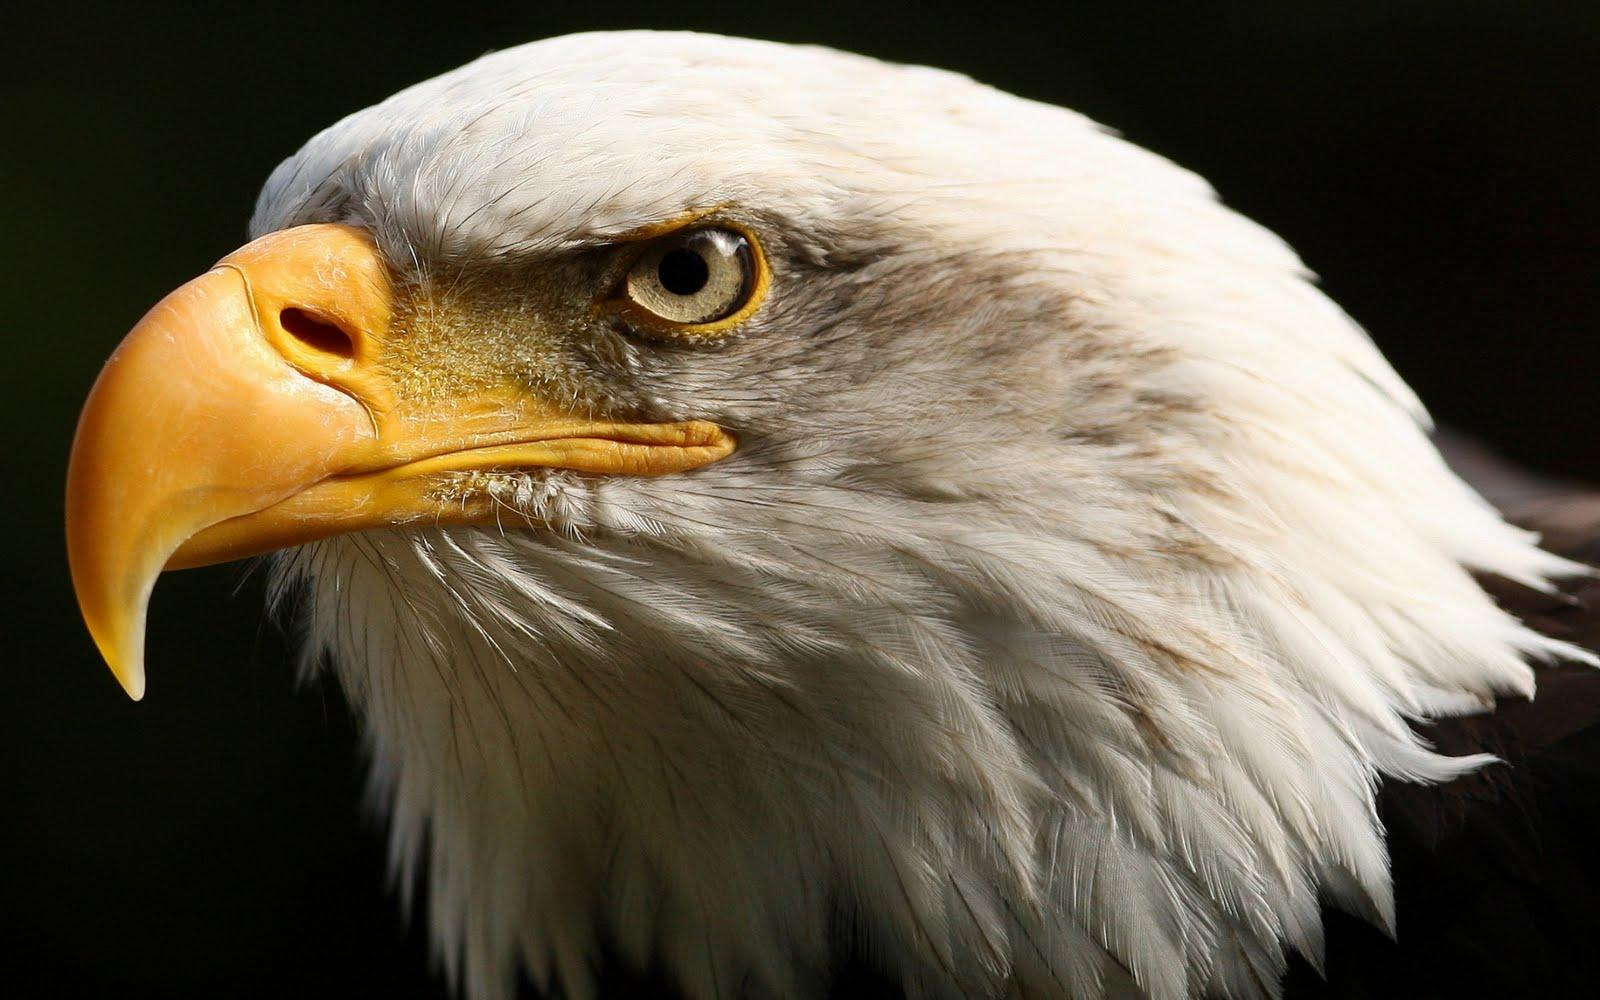 Best Javan Hawk-Eagle Wallpaper Picture #2479 Wallpaper | High ...